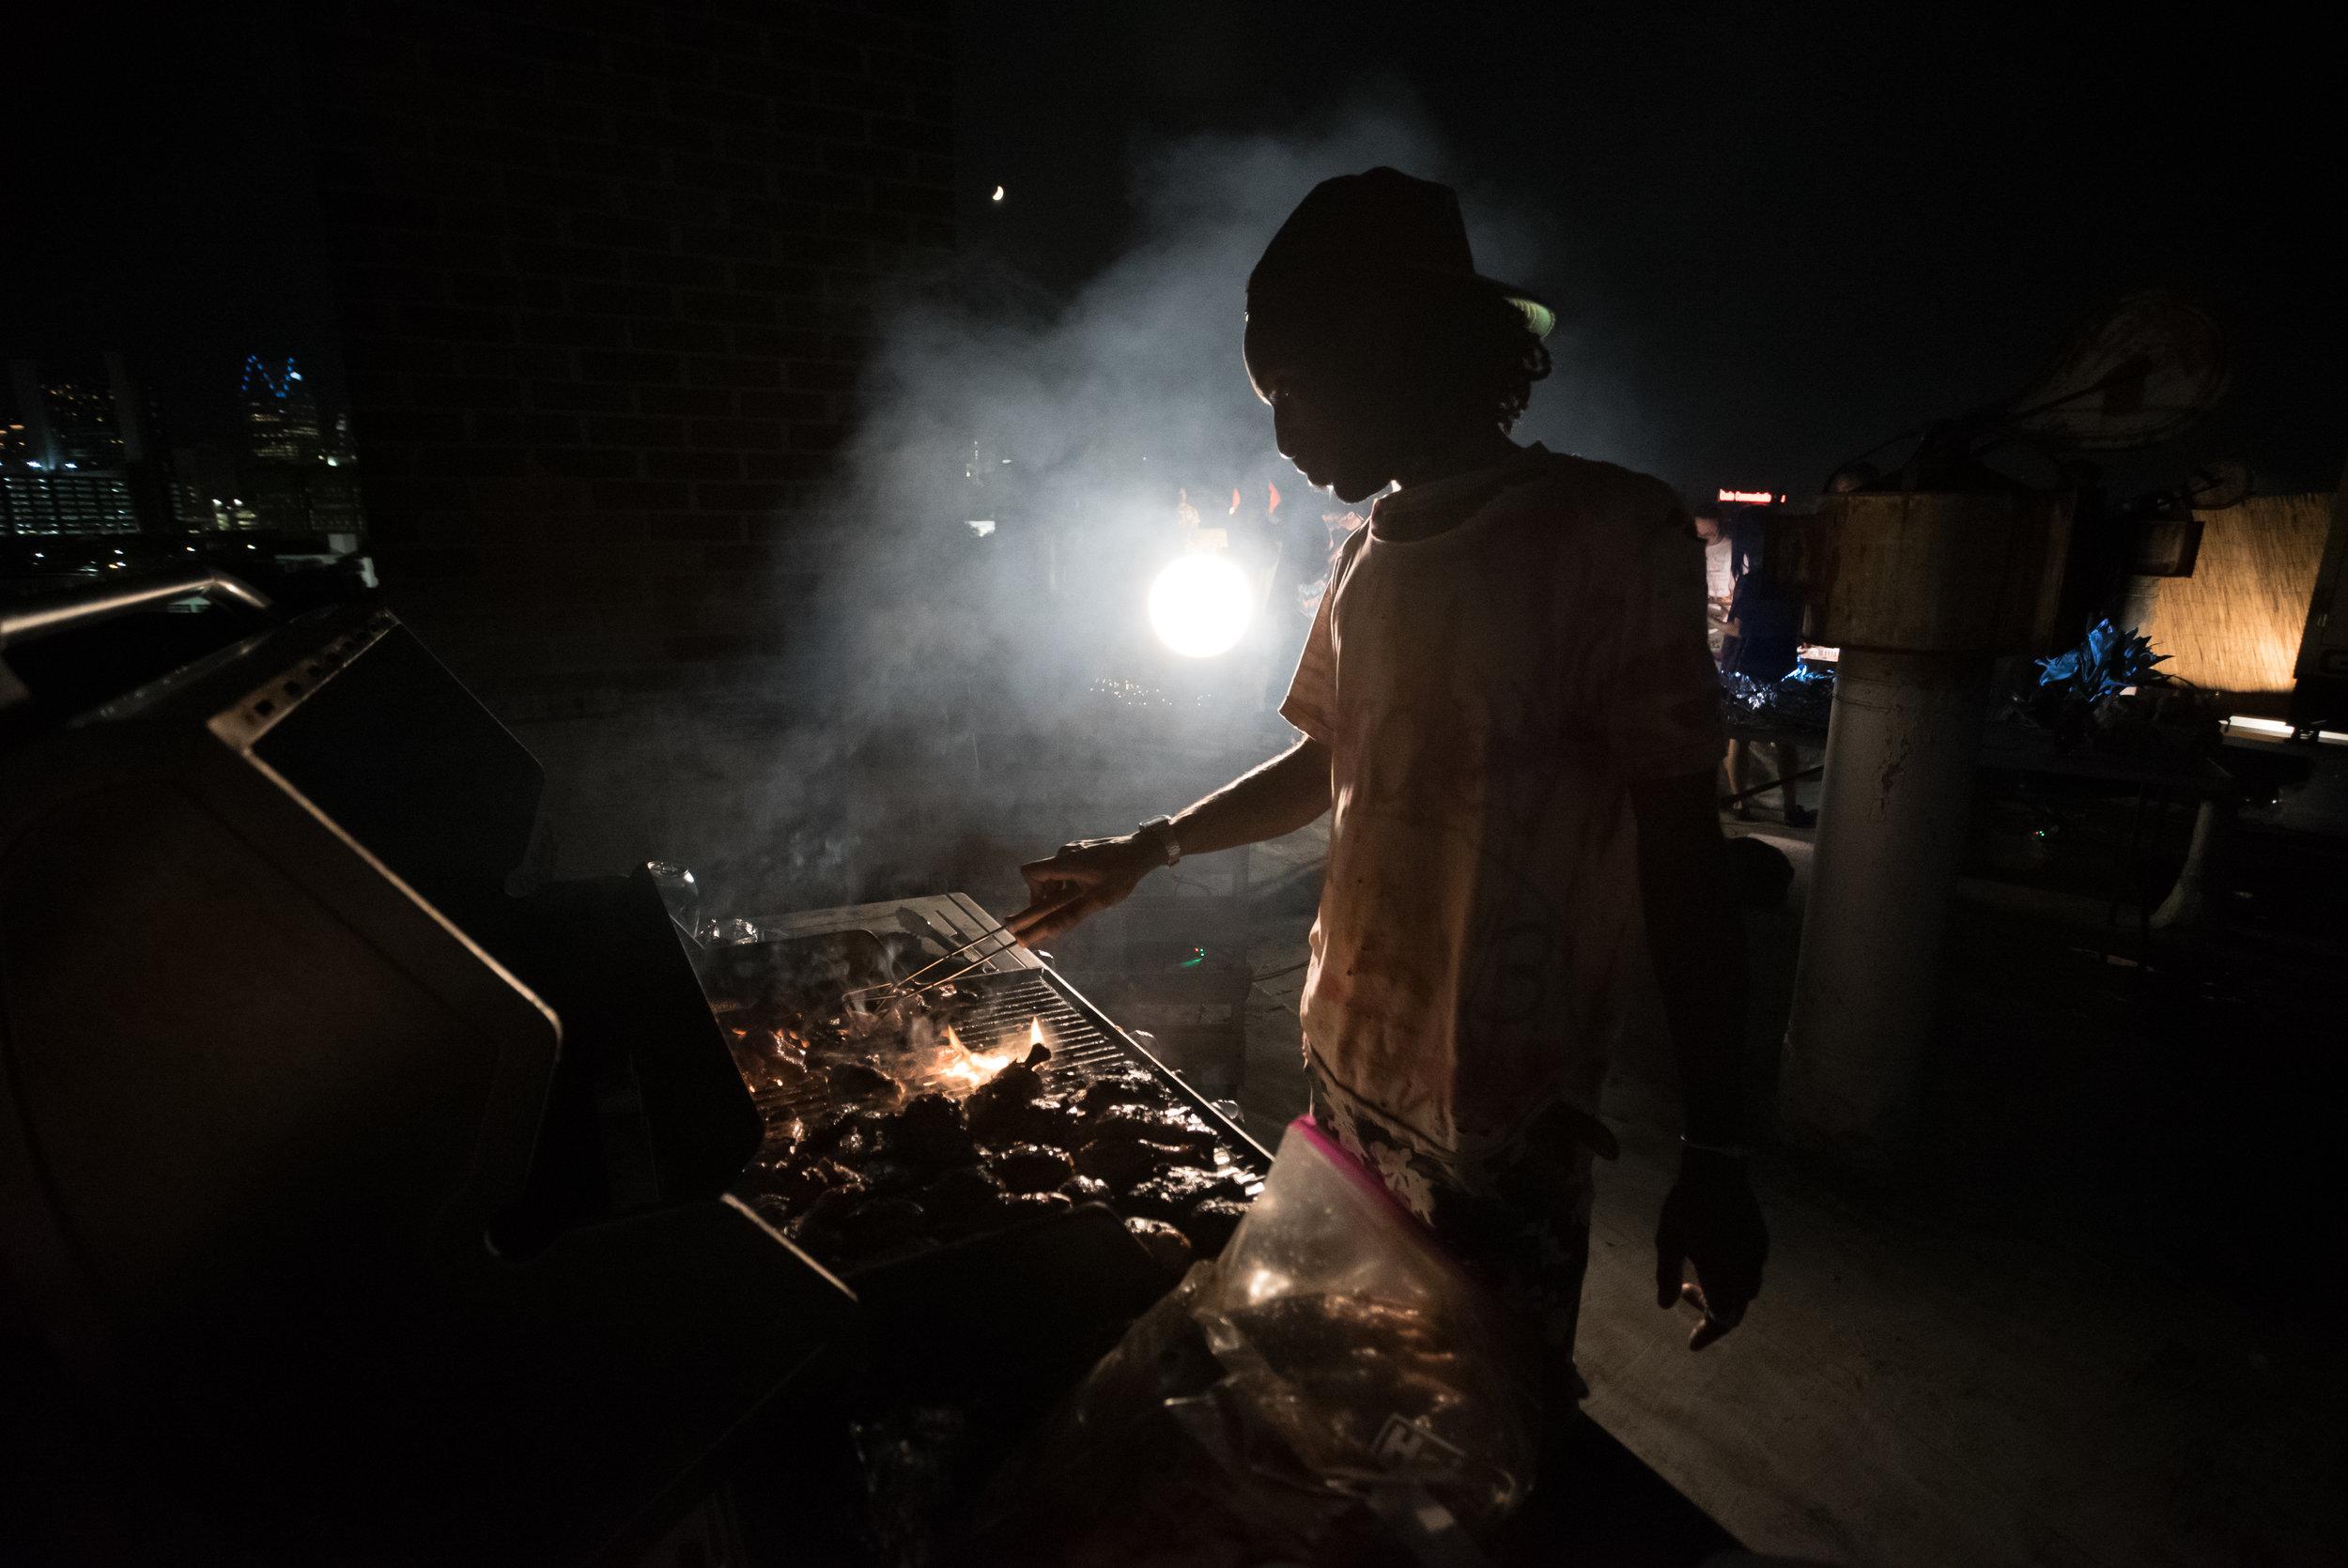 Temple-Children-Dinner-1xrun-MITM-EmadRashidi_00006.jpg